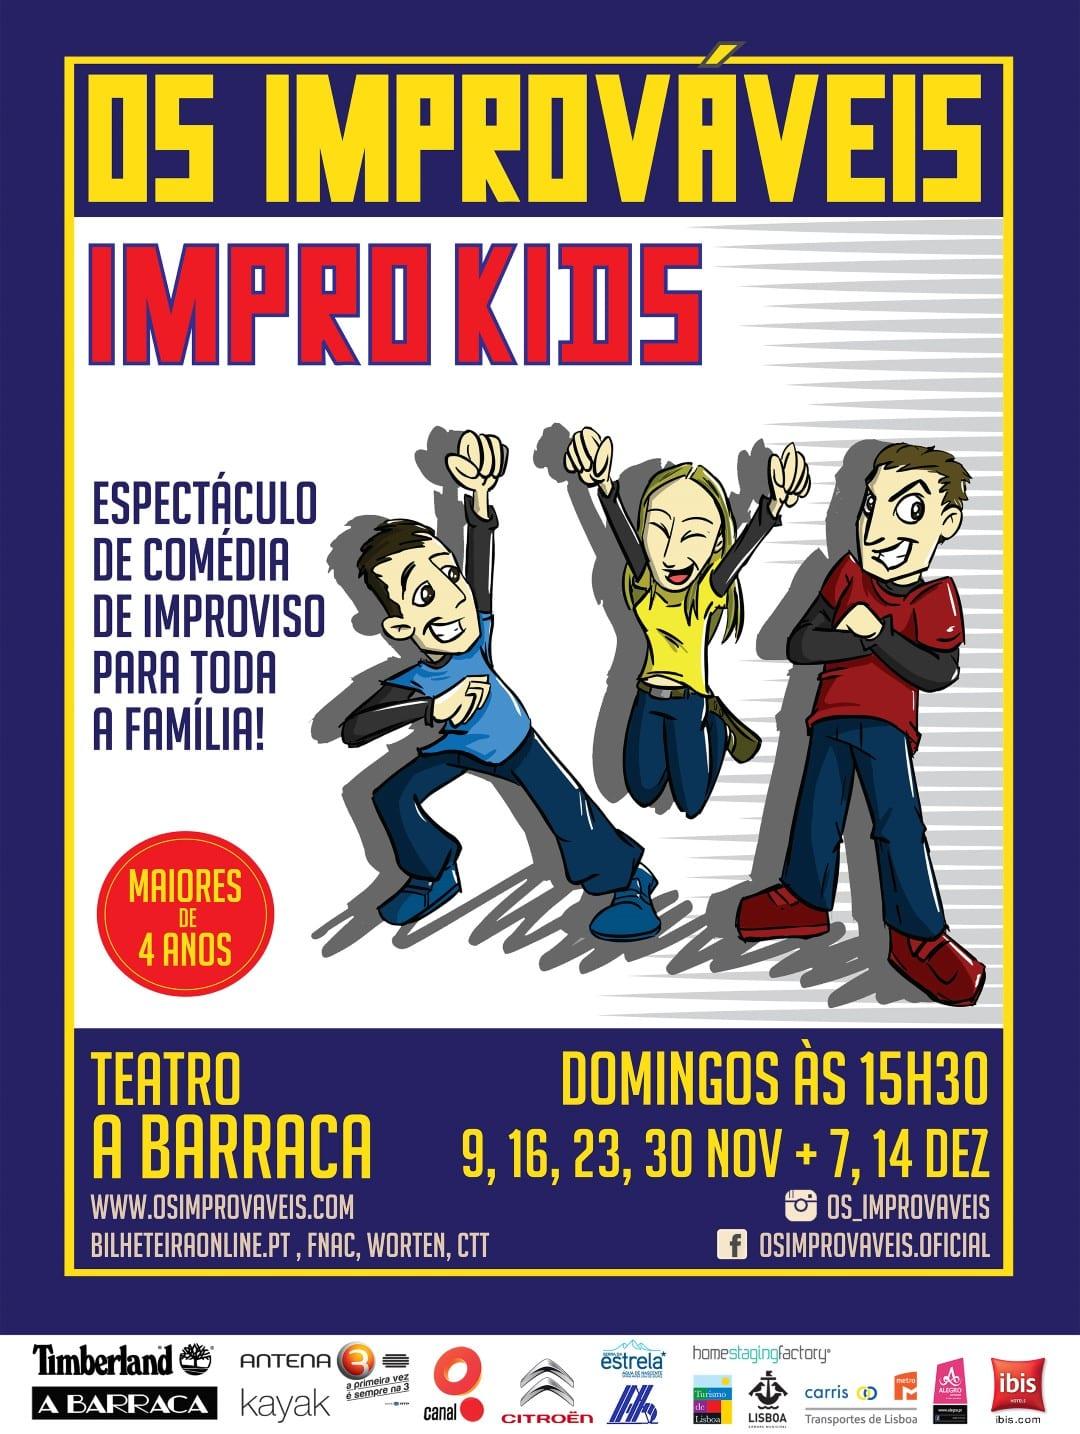 iMPROkIDS - A Fábrica